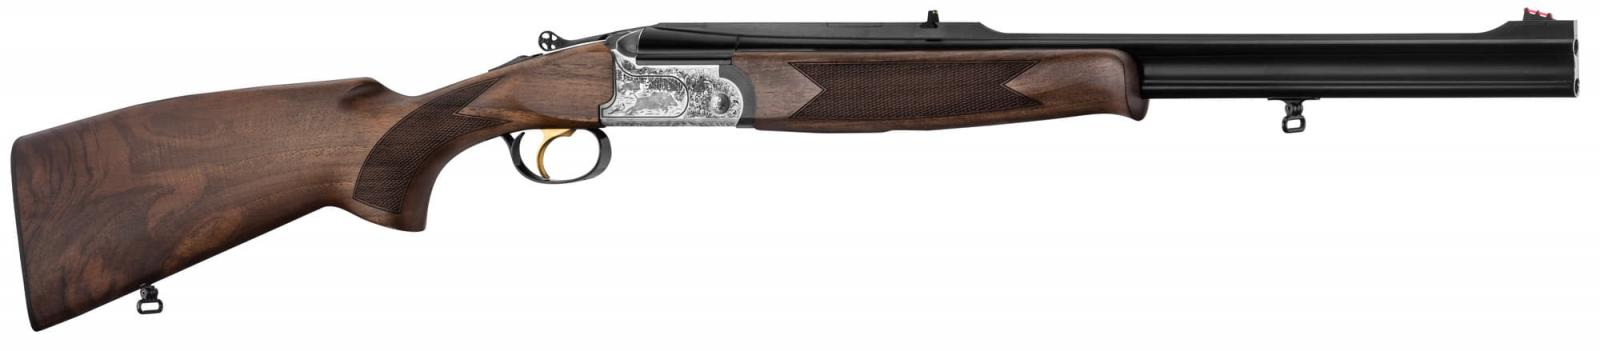 Carabine FAIR EXPRESS CLASSIC ACIER